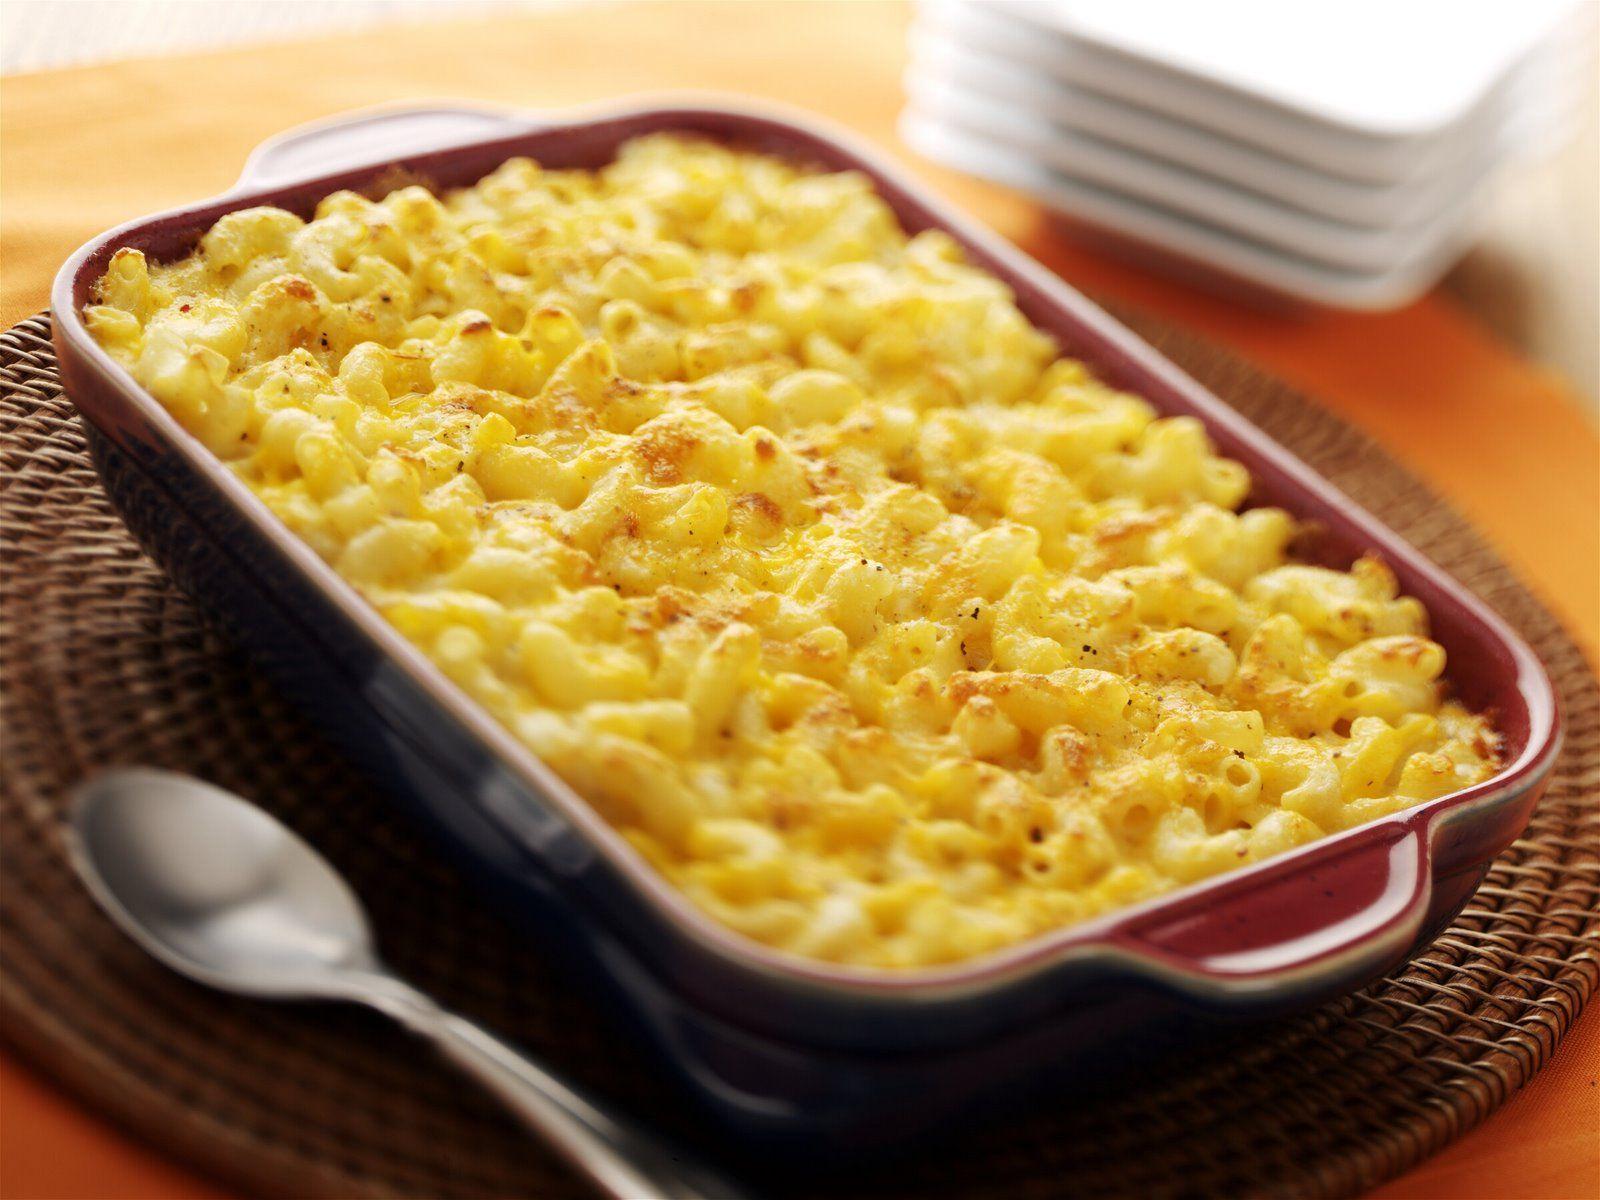 Easy Peasy Cheesy Macaroni Cheese Recipes Vegan Pasta Dish Easy Mac And Cheese